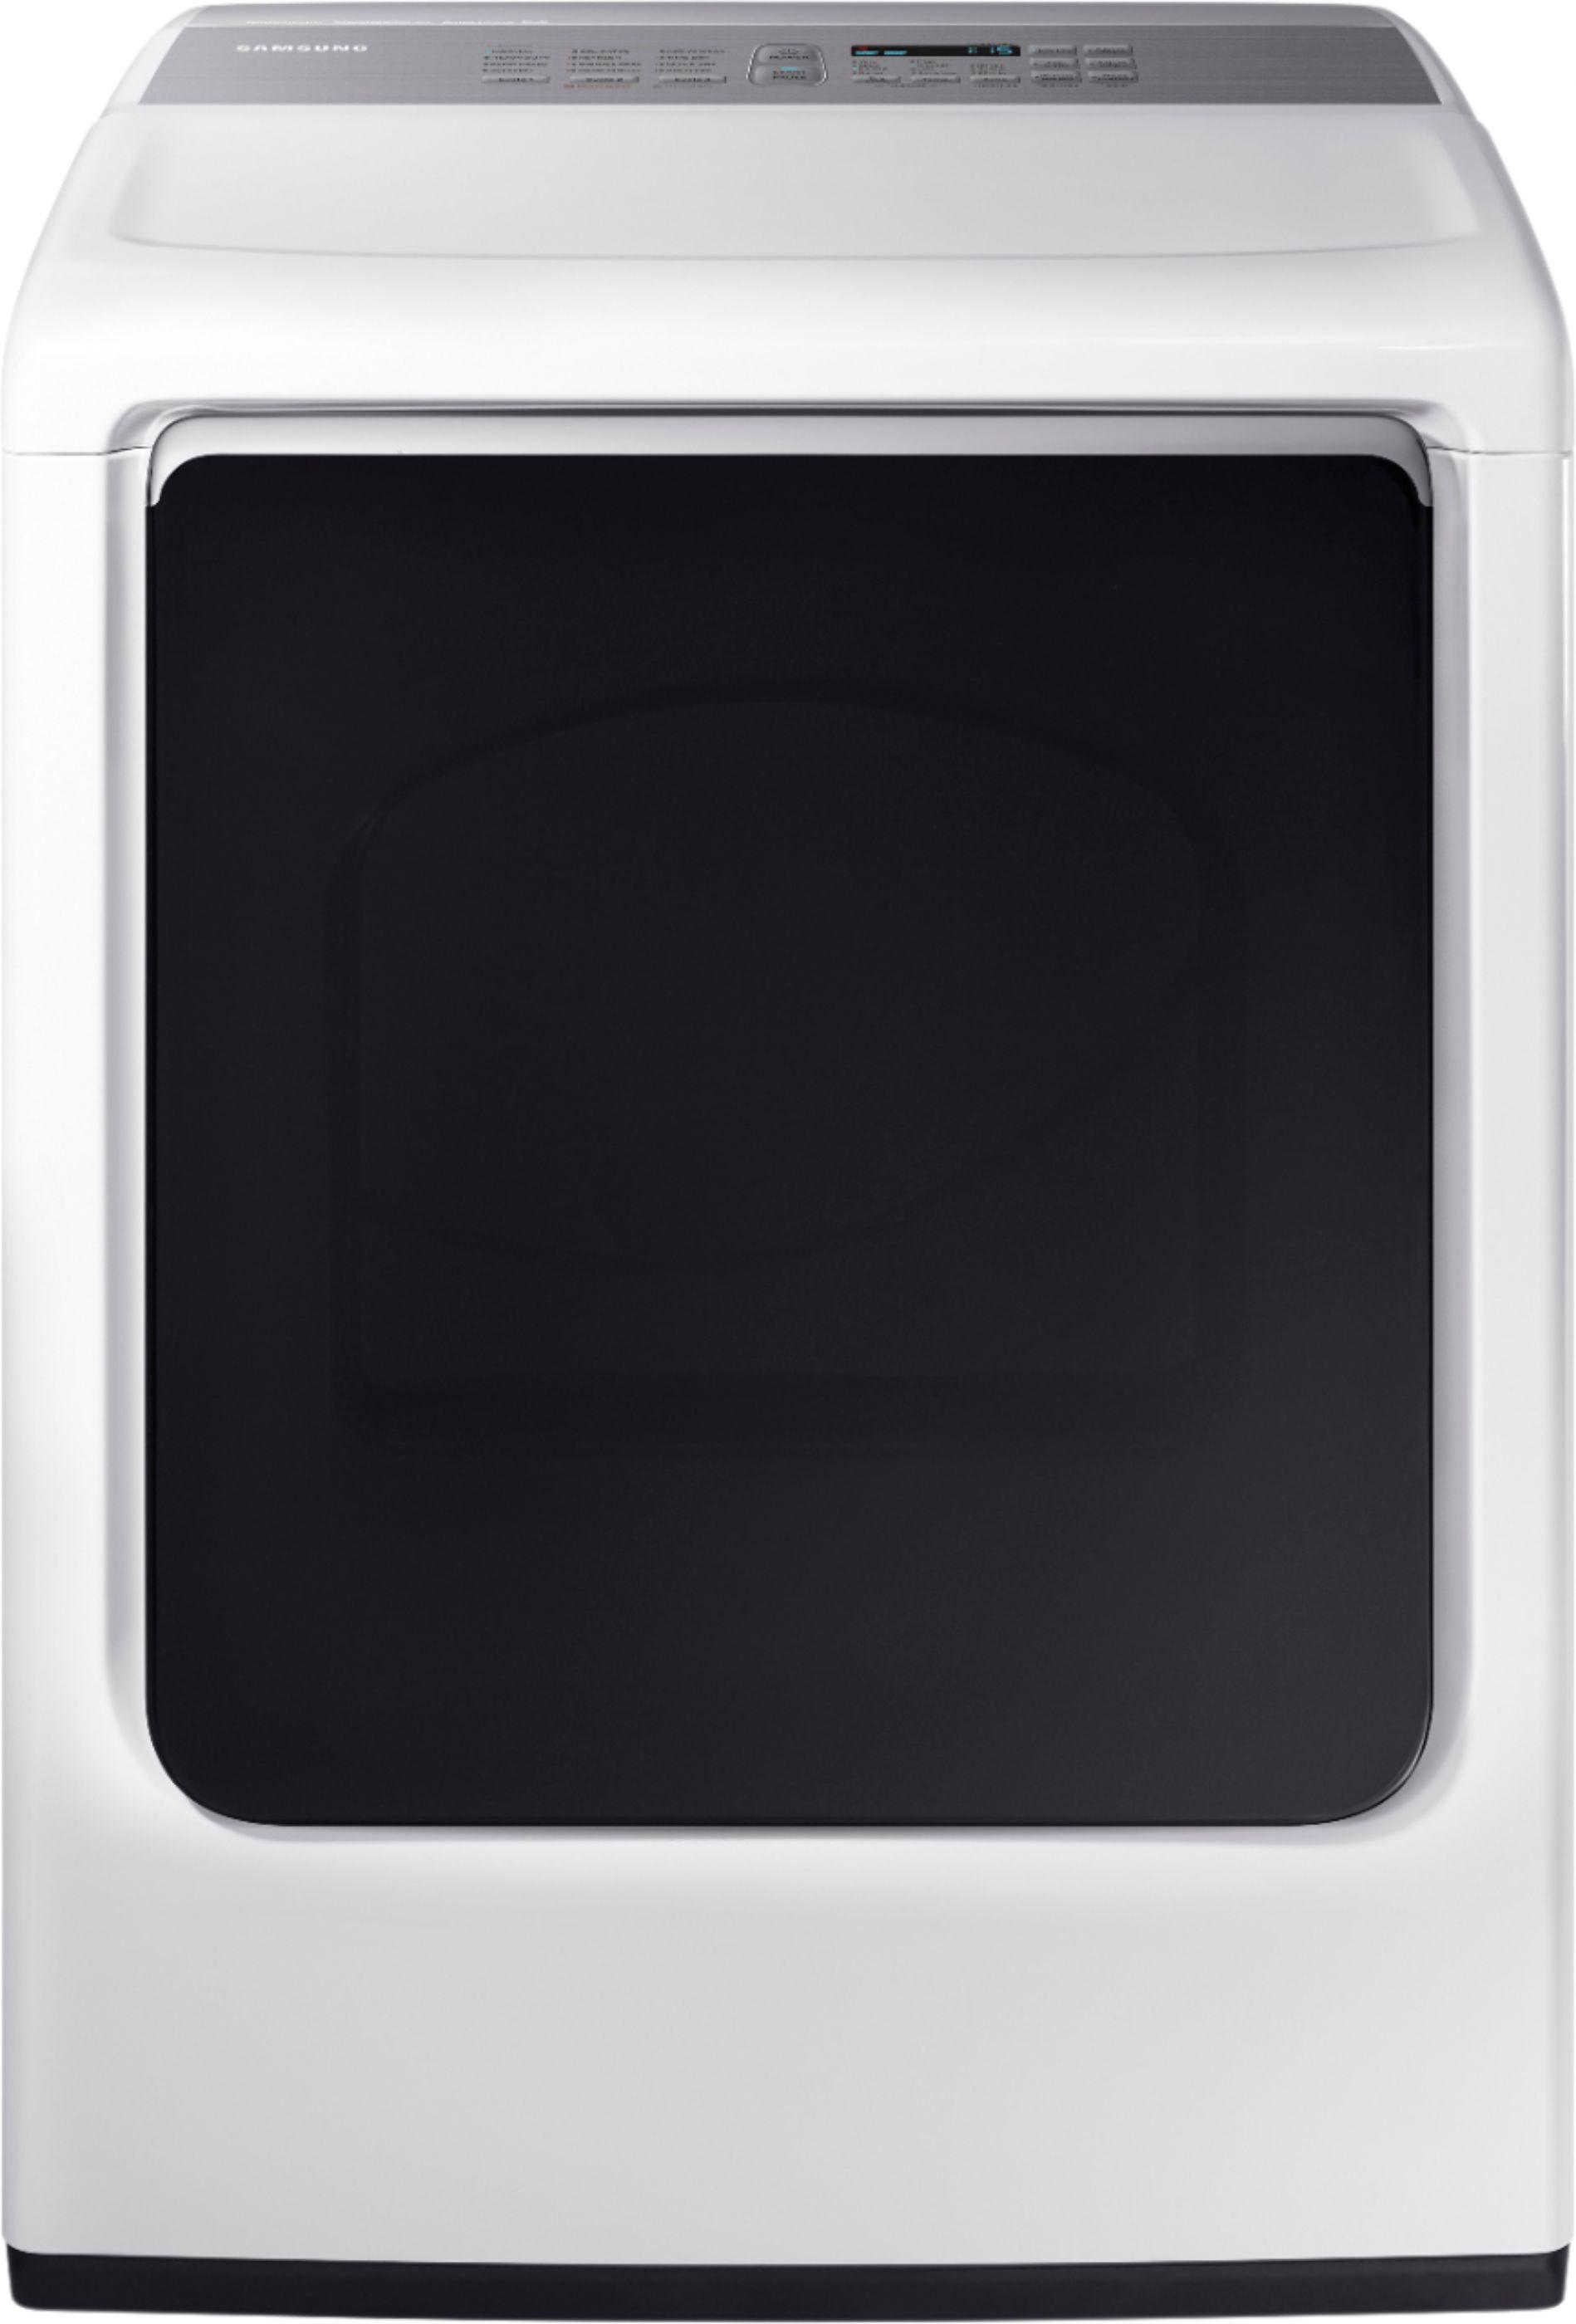 Samsung 7.4 cu. ft. Capacity DOE Electric Dryer White DVE52M8650W